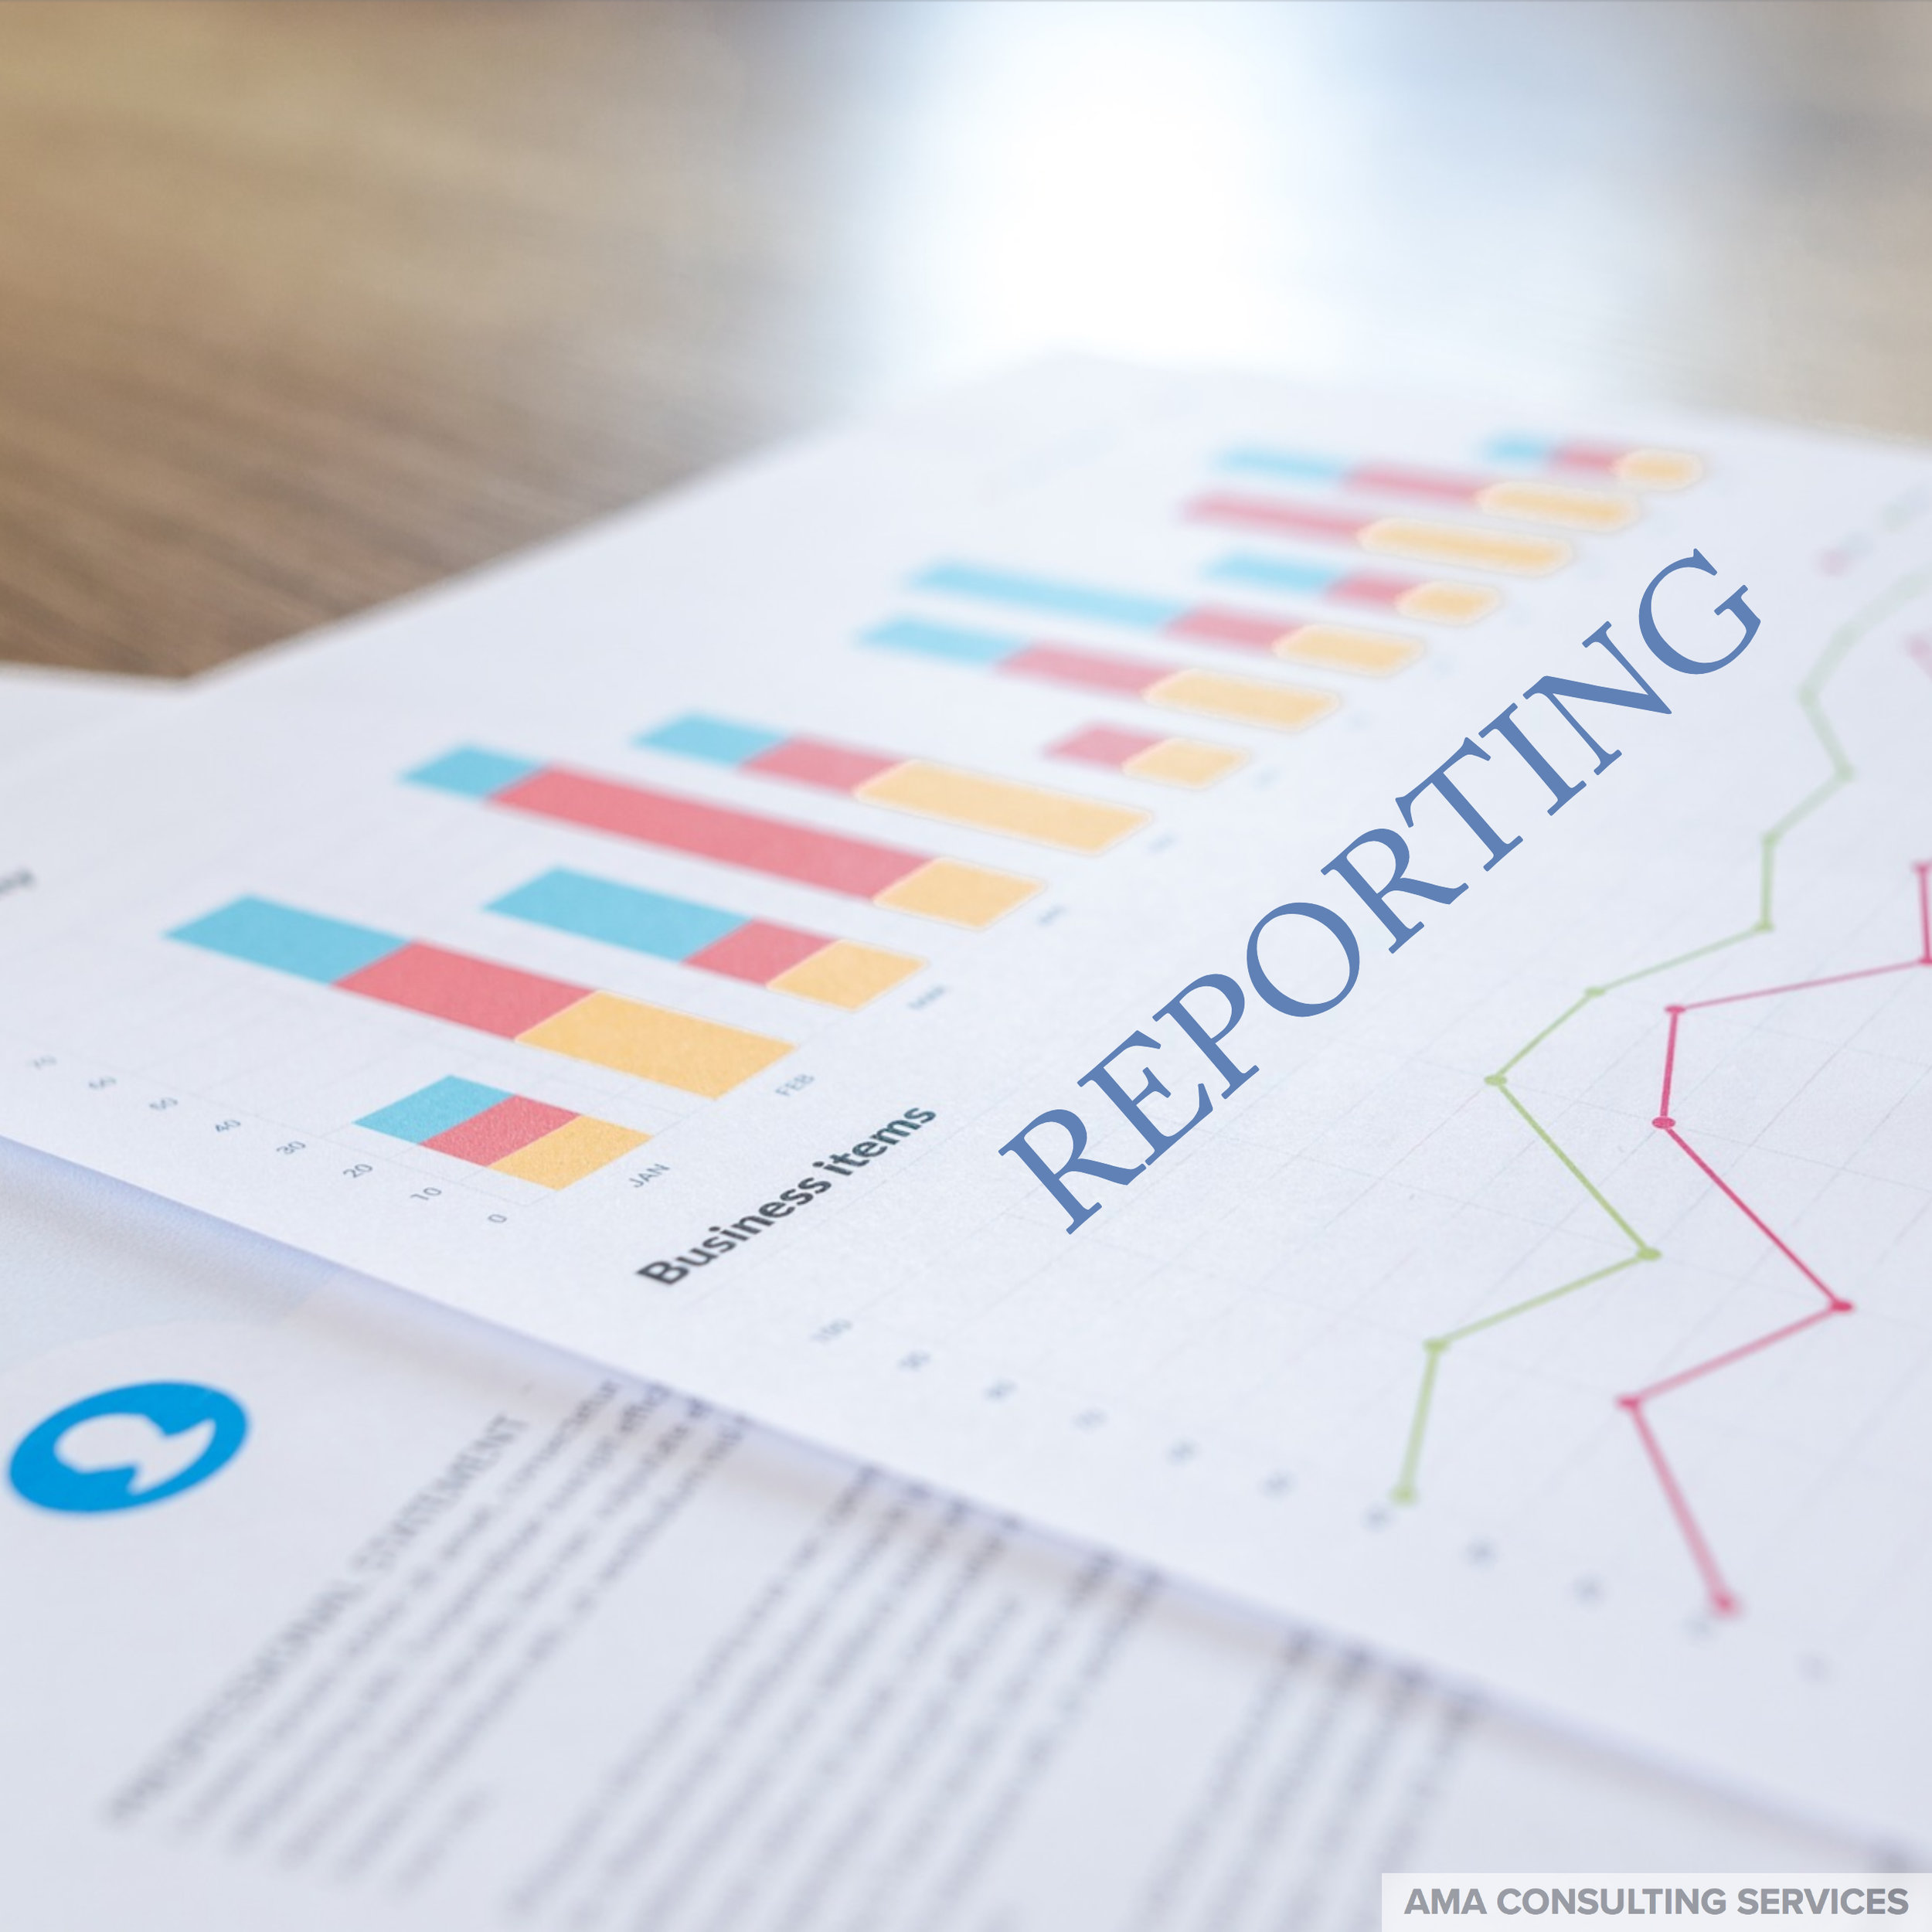 digital-marketing-reporting.jpg